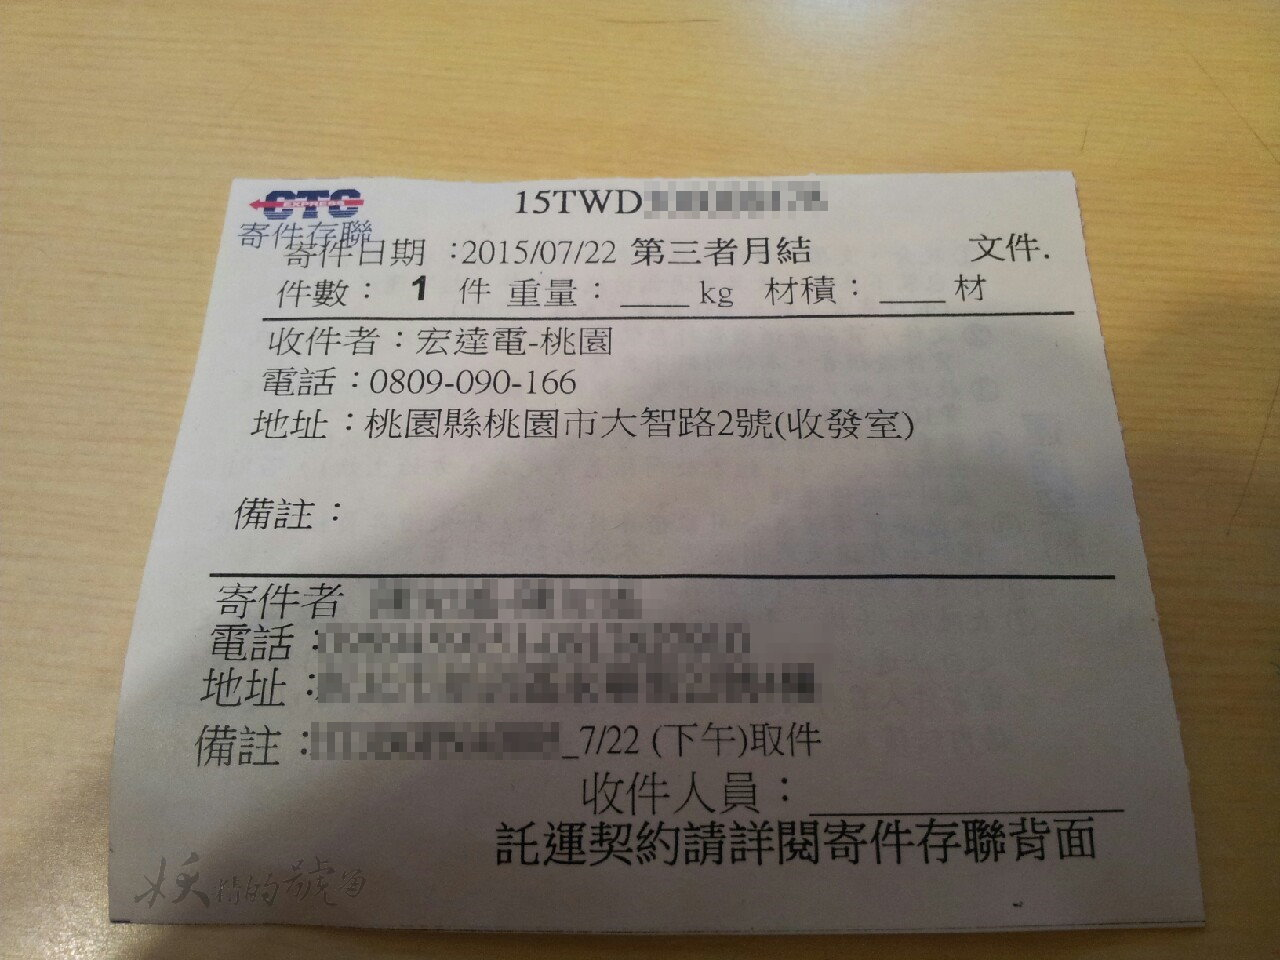 20150806 45 - HTC Butterfly S 相機紫光 - 過保維修記(已s-off + Unlocked)